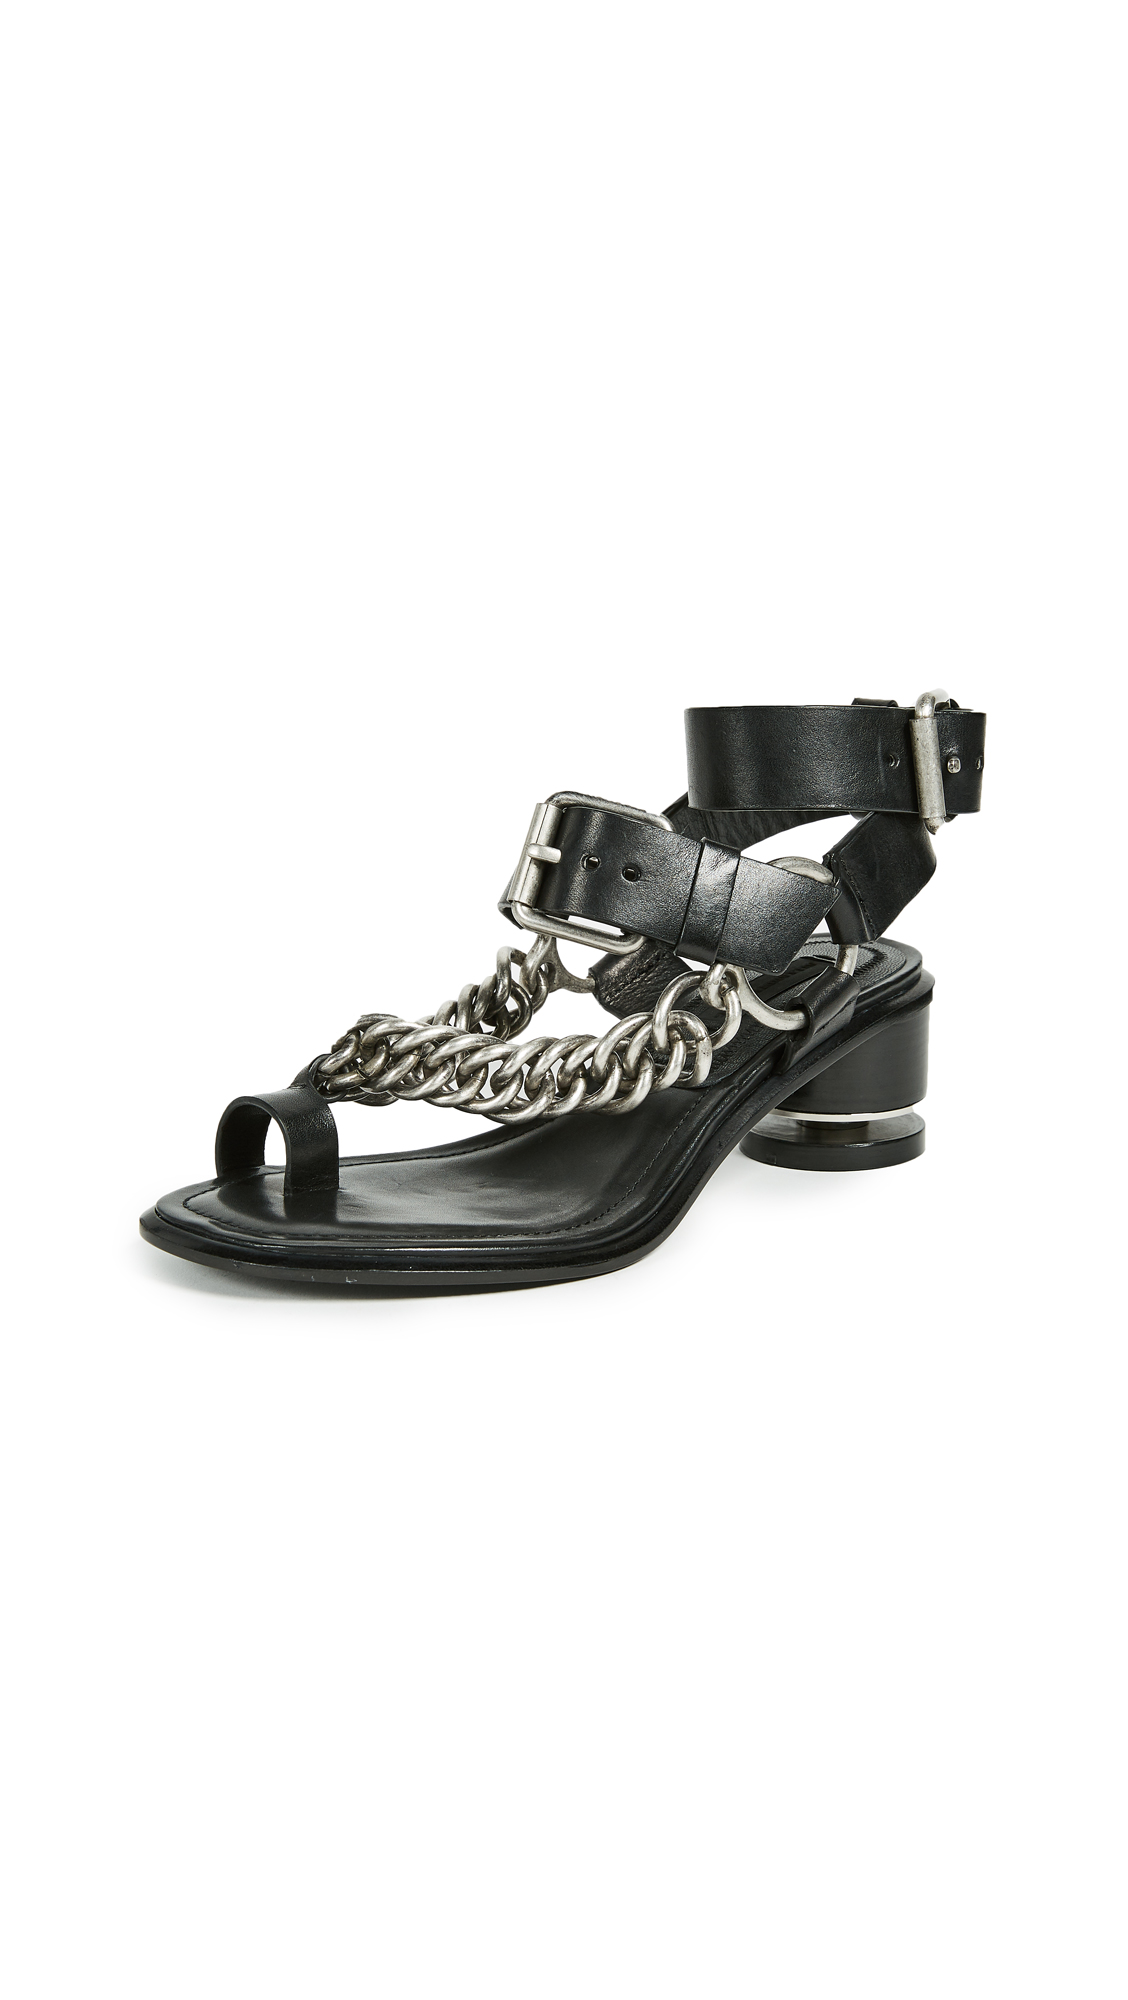 Alexander Wang Jada Chain Sandals - Black